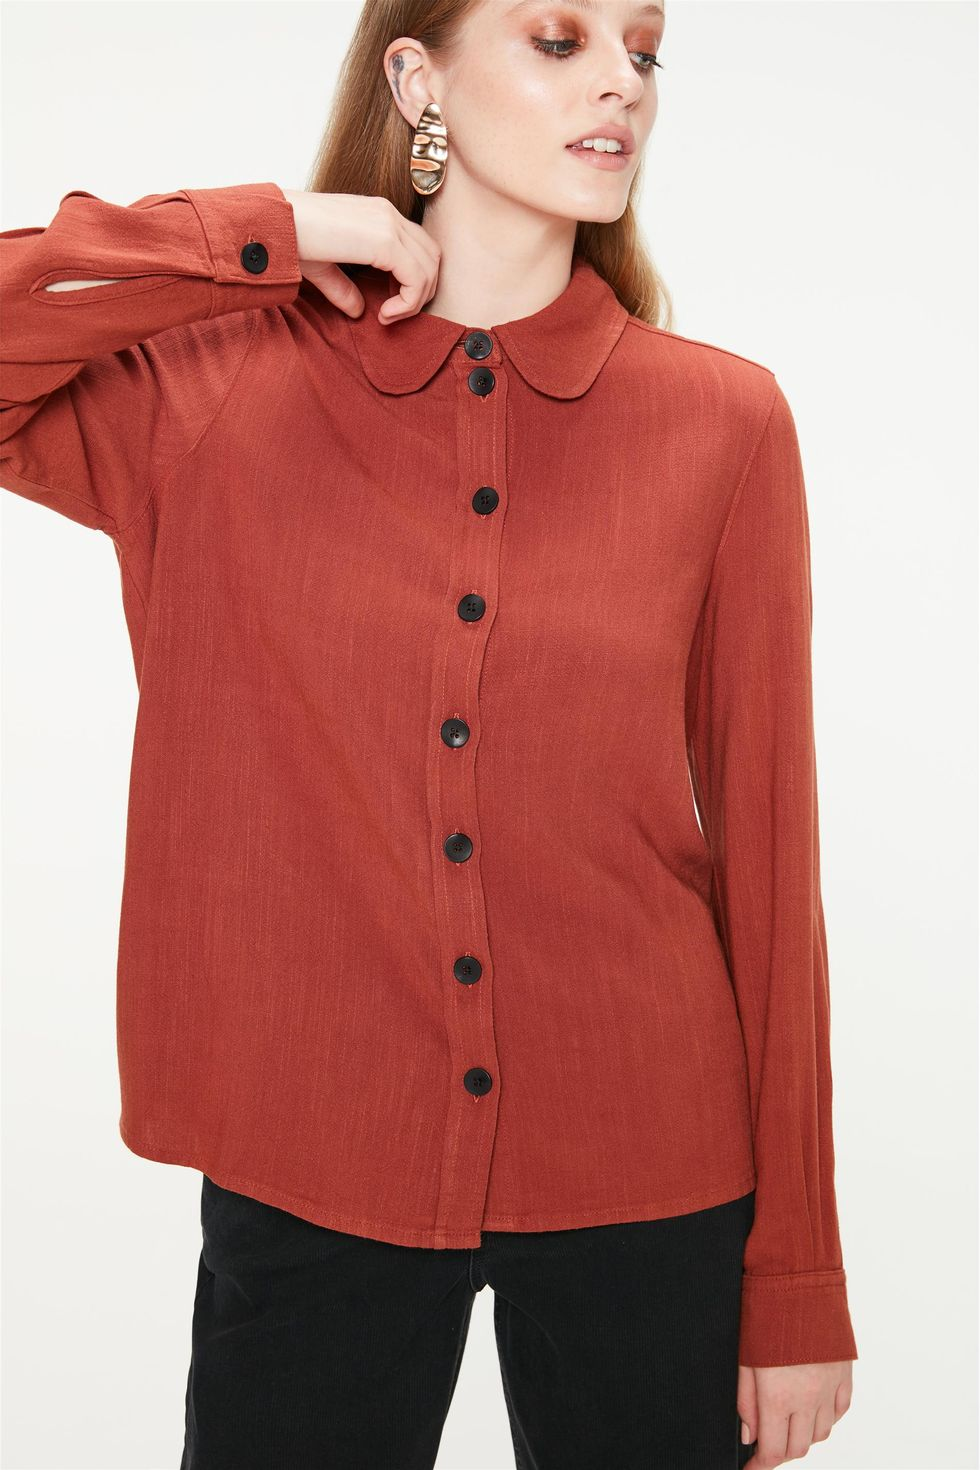 Camisa-Feminina-Terracota-Frente--